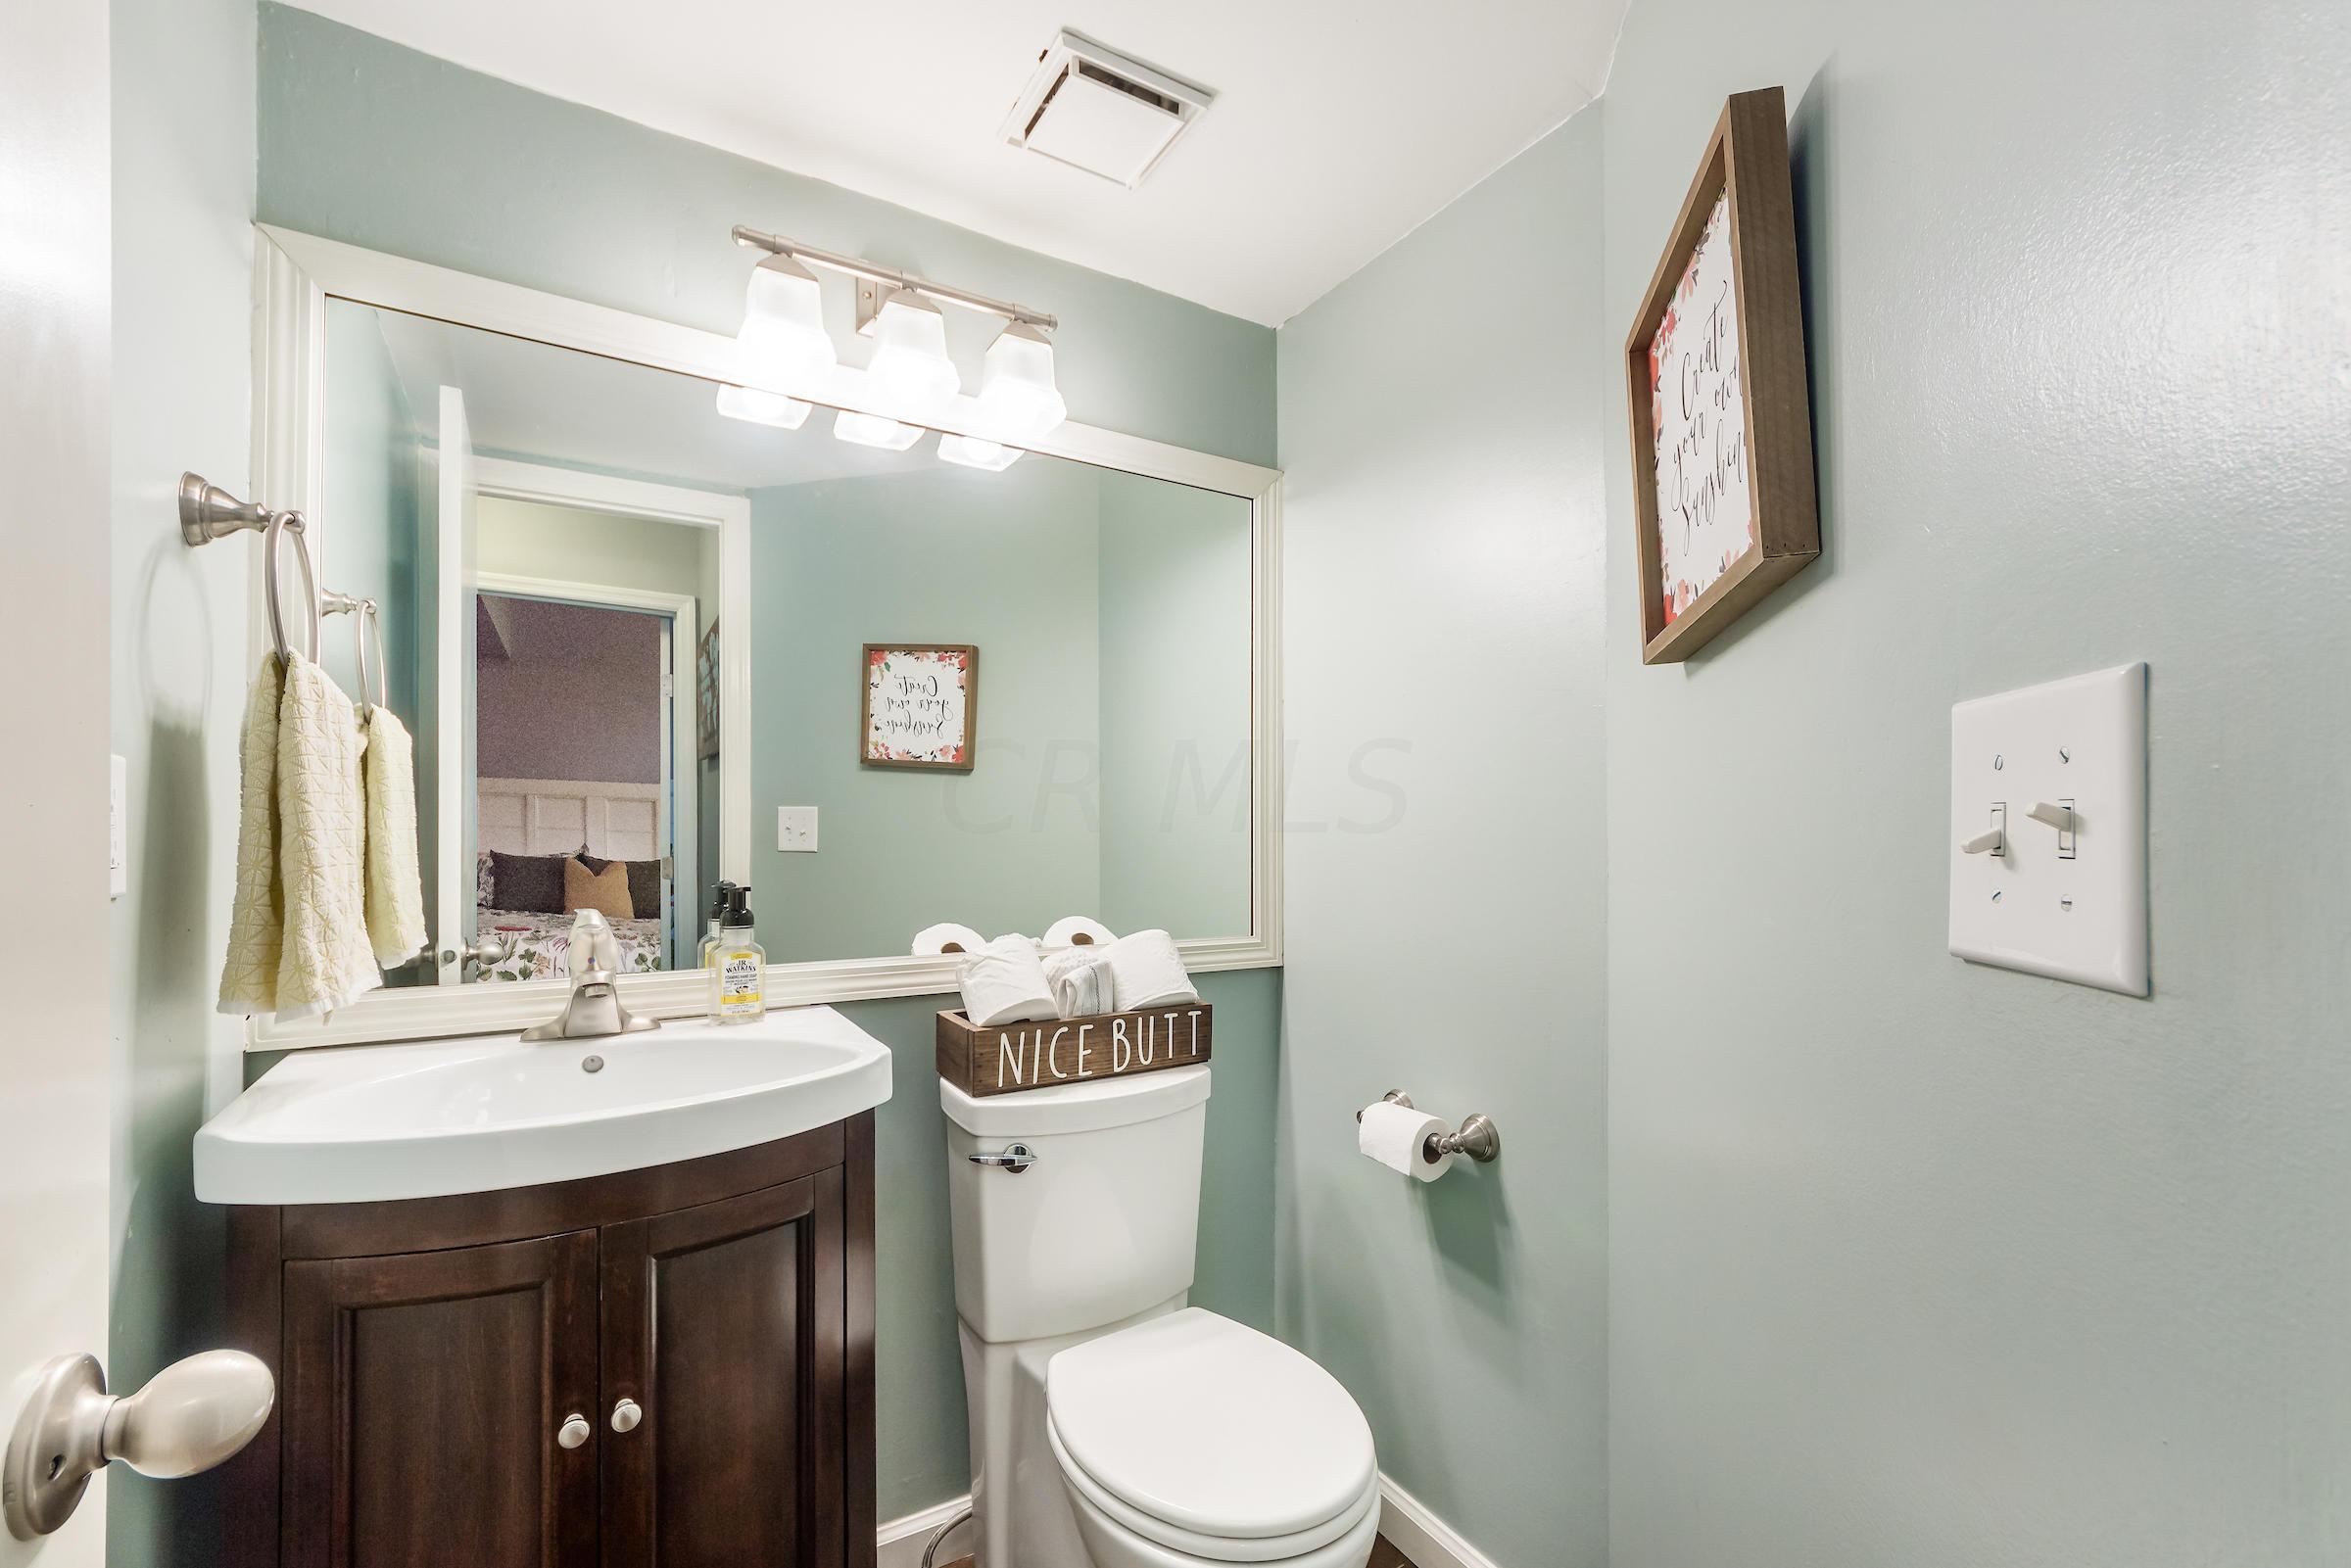 7173 Fitzwilliam Drive, Dublin, Ohio 43017, 4 Bedrooms Bedrooms, ,3 BathroomsBathrooms,Residential,For Sale,Fitzwilliam,220023632